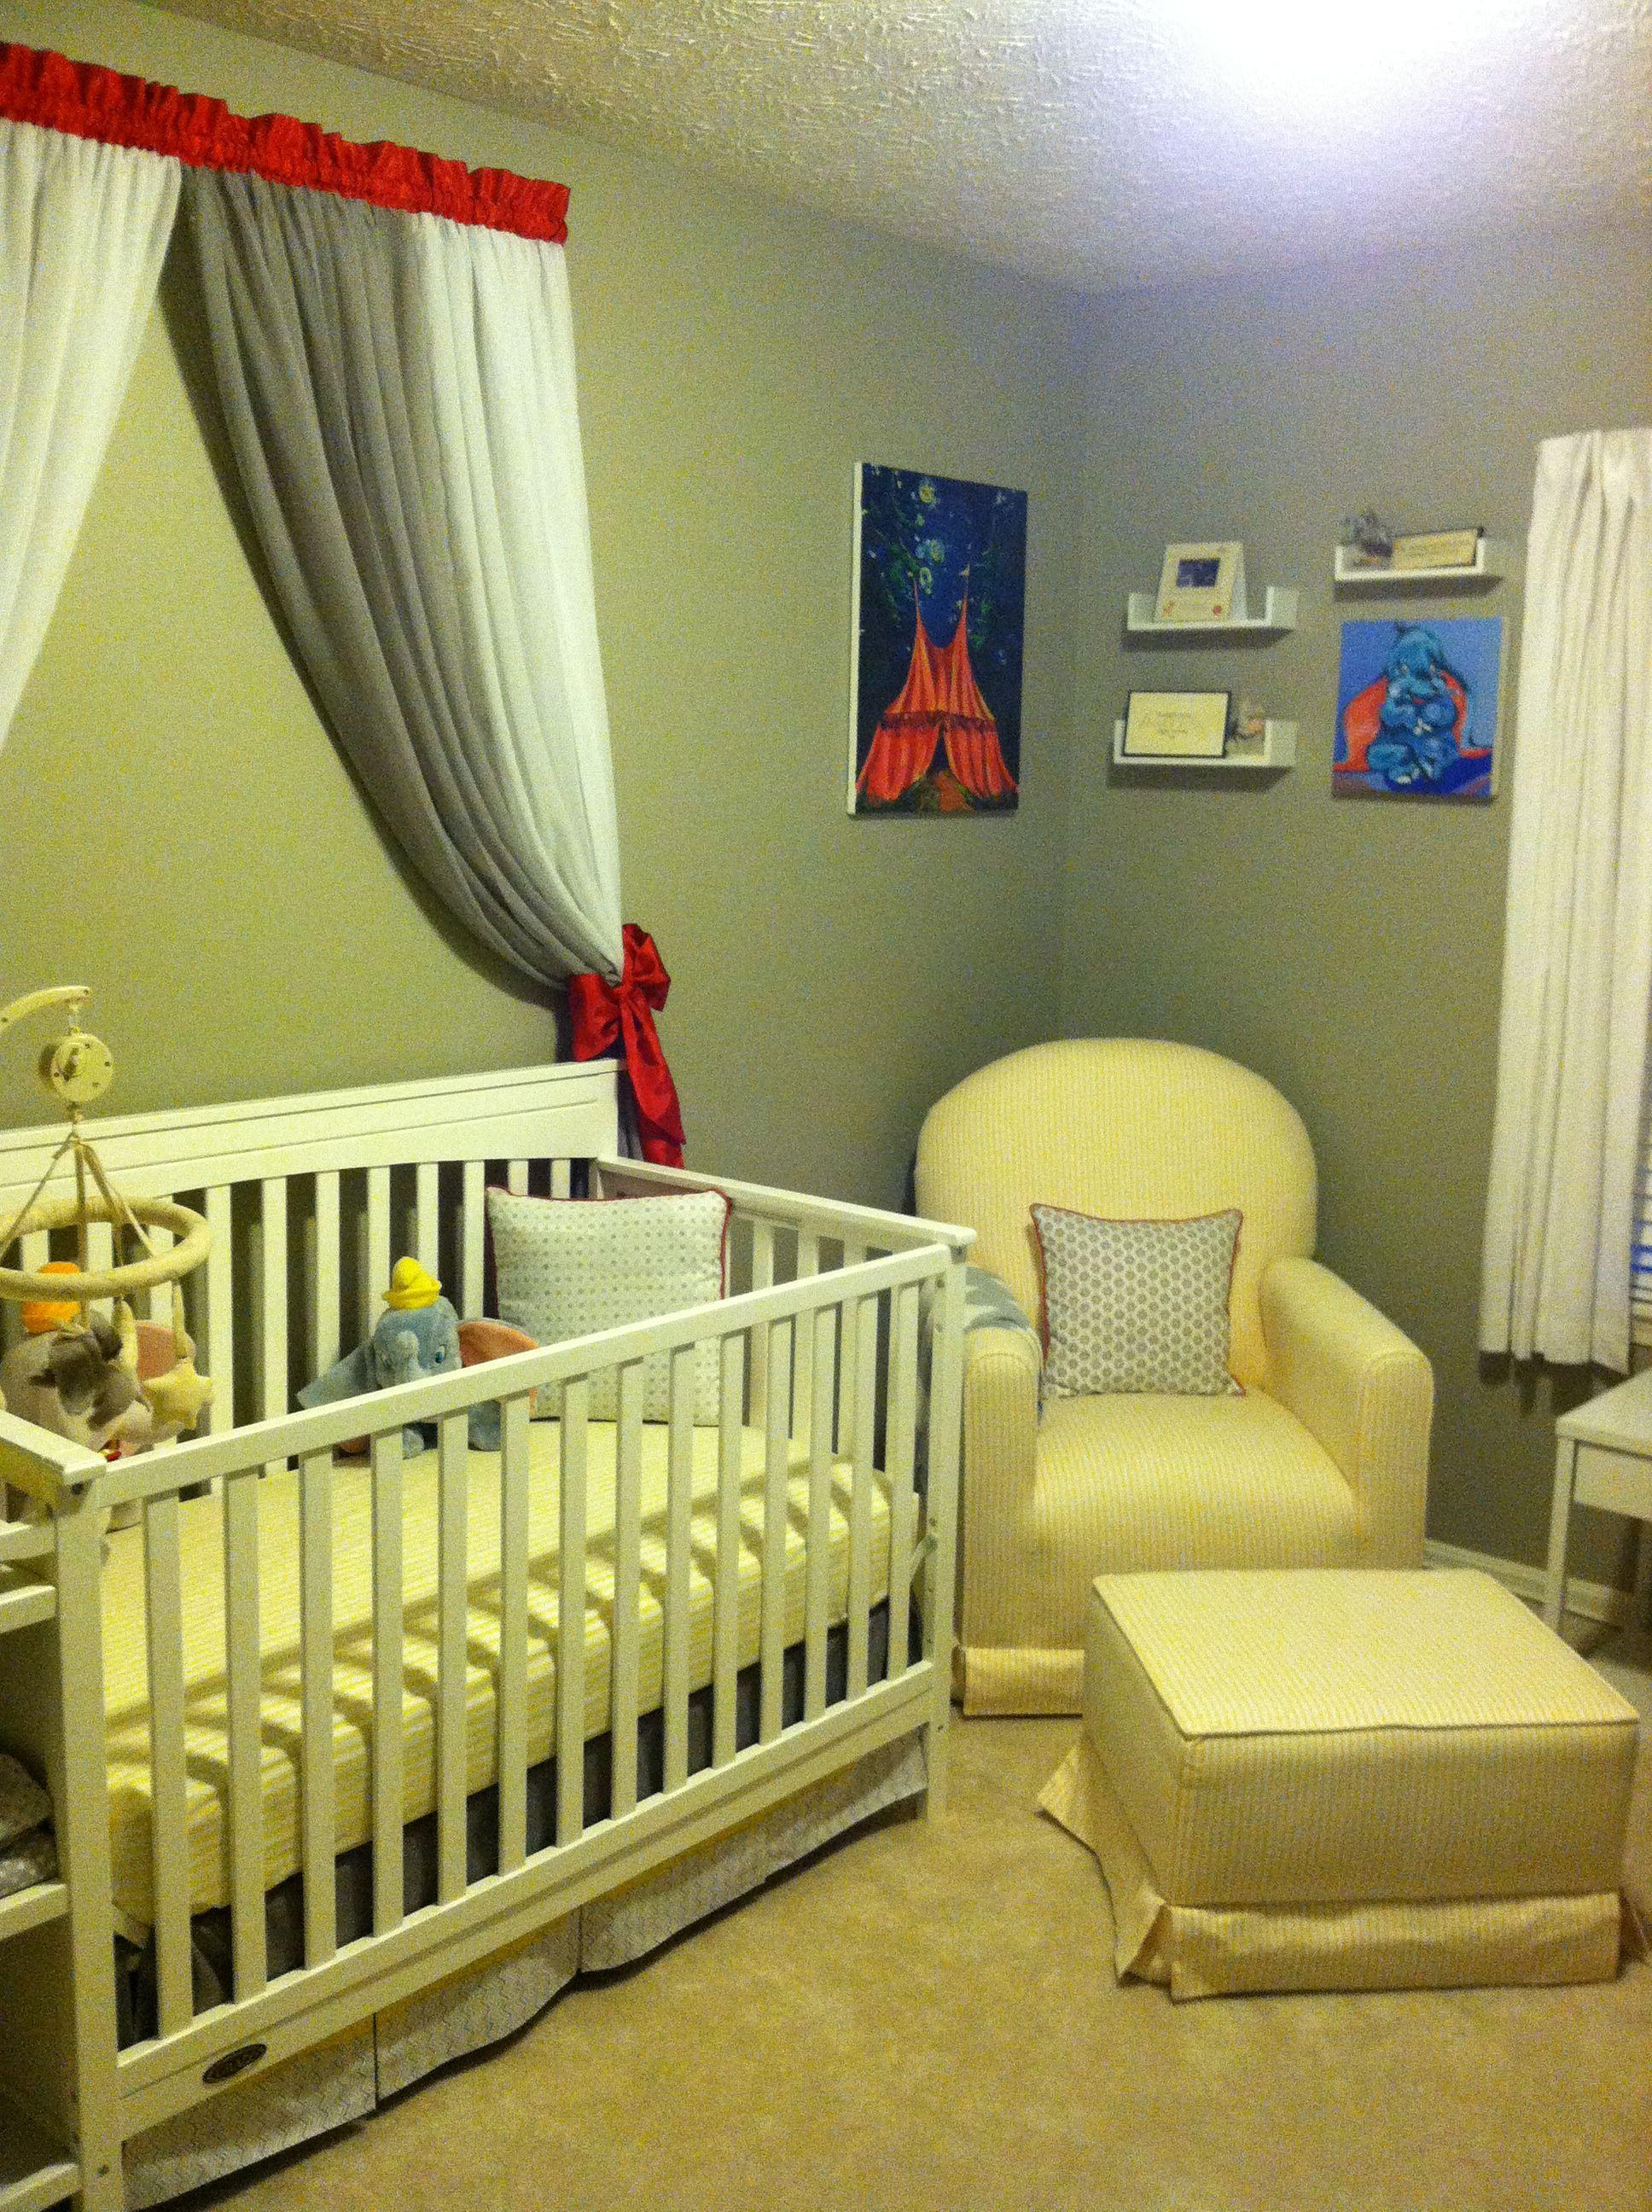 Circusdumbo Themed Baby Nursery